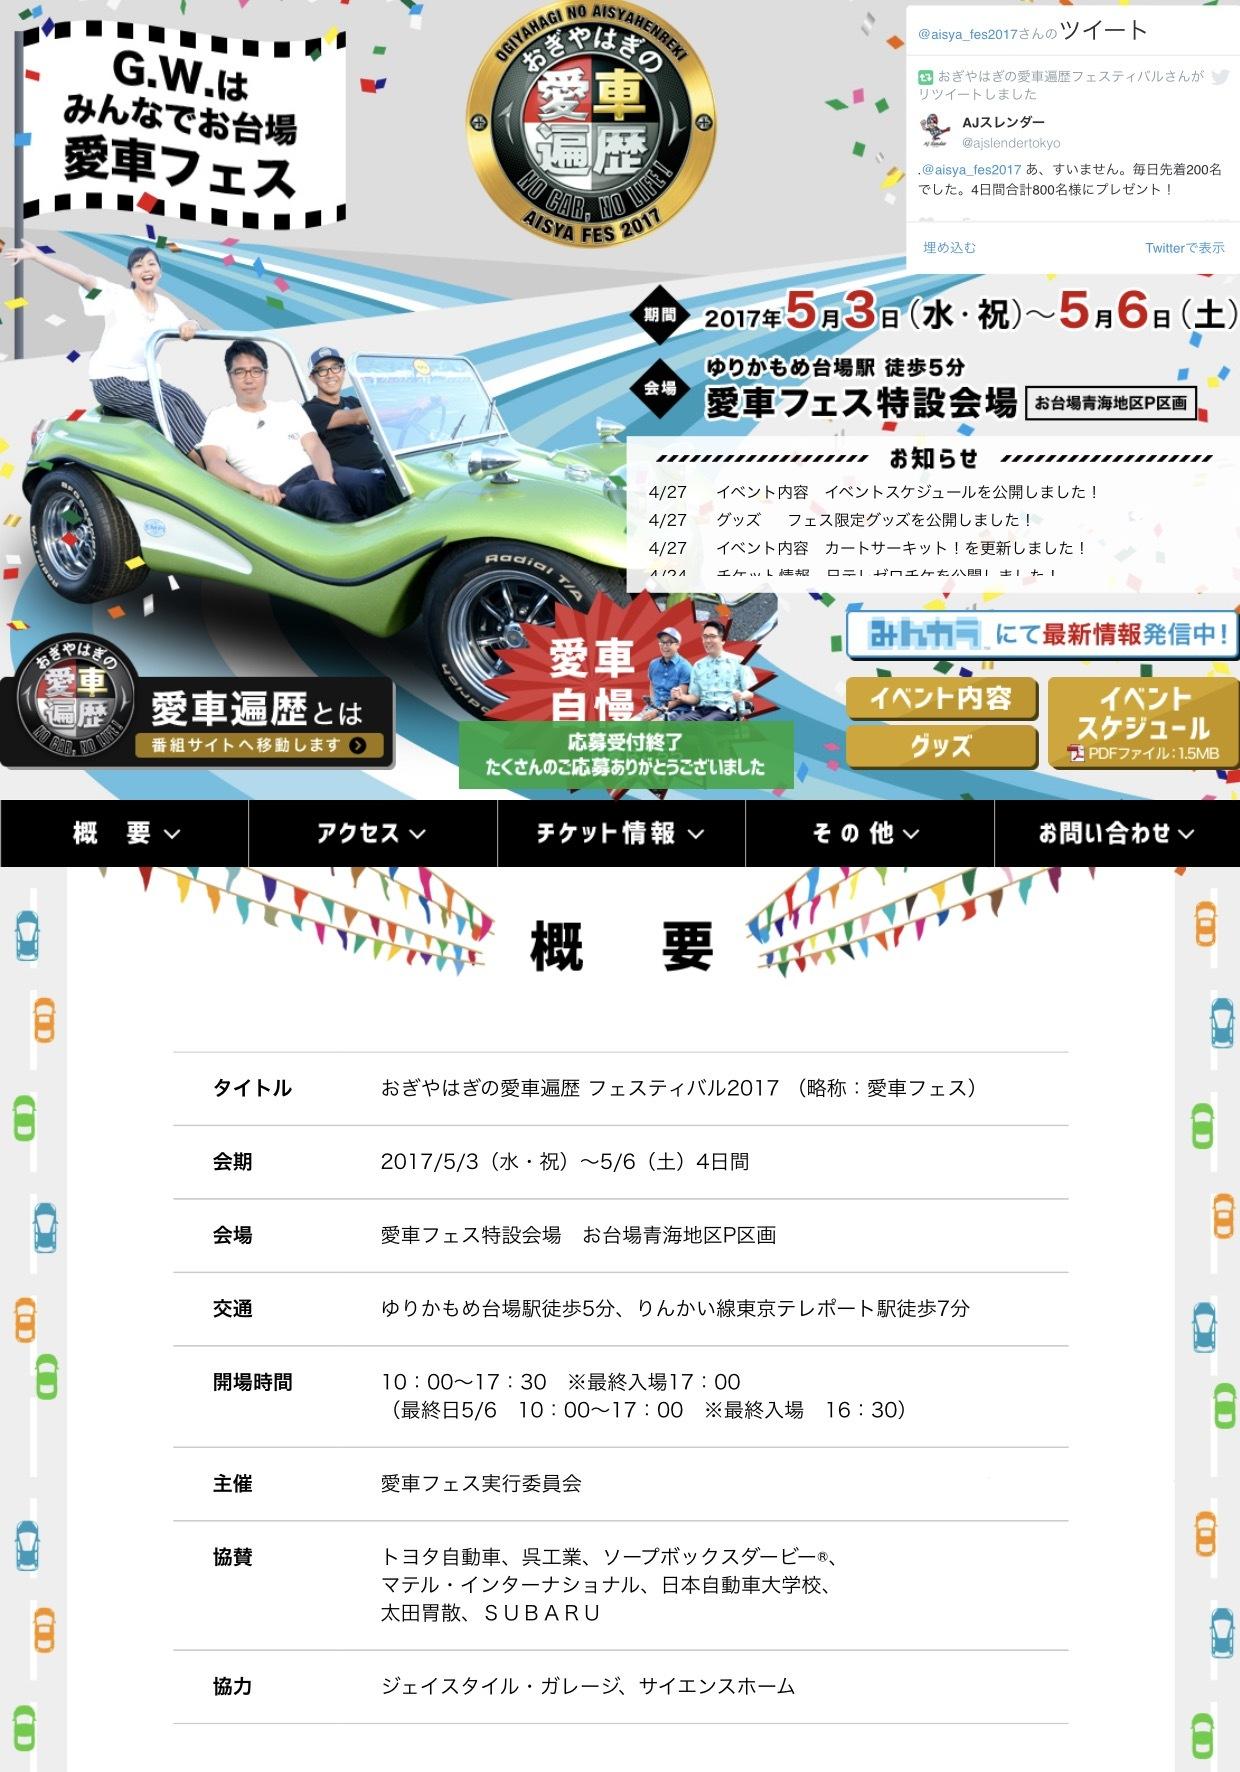 GO! GO! 5月!!  〜ライブスケジュール〜_f0115311_02341021.png